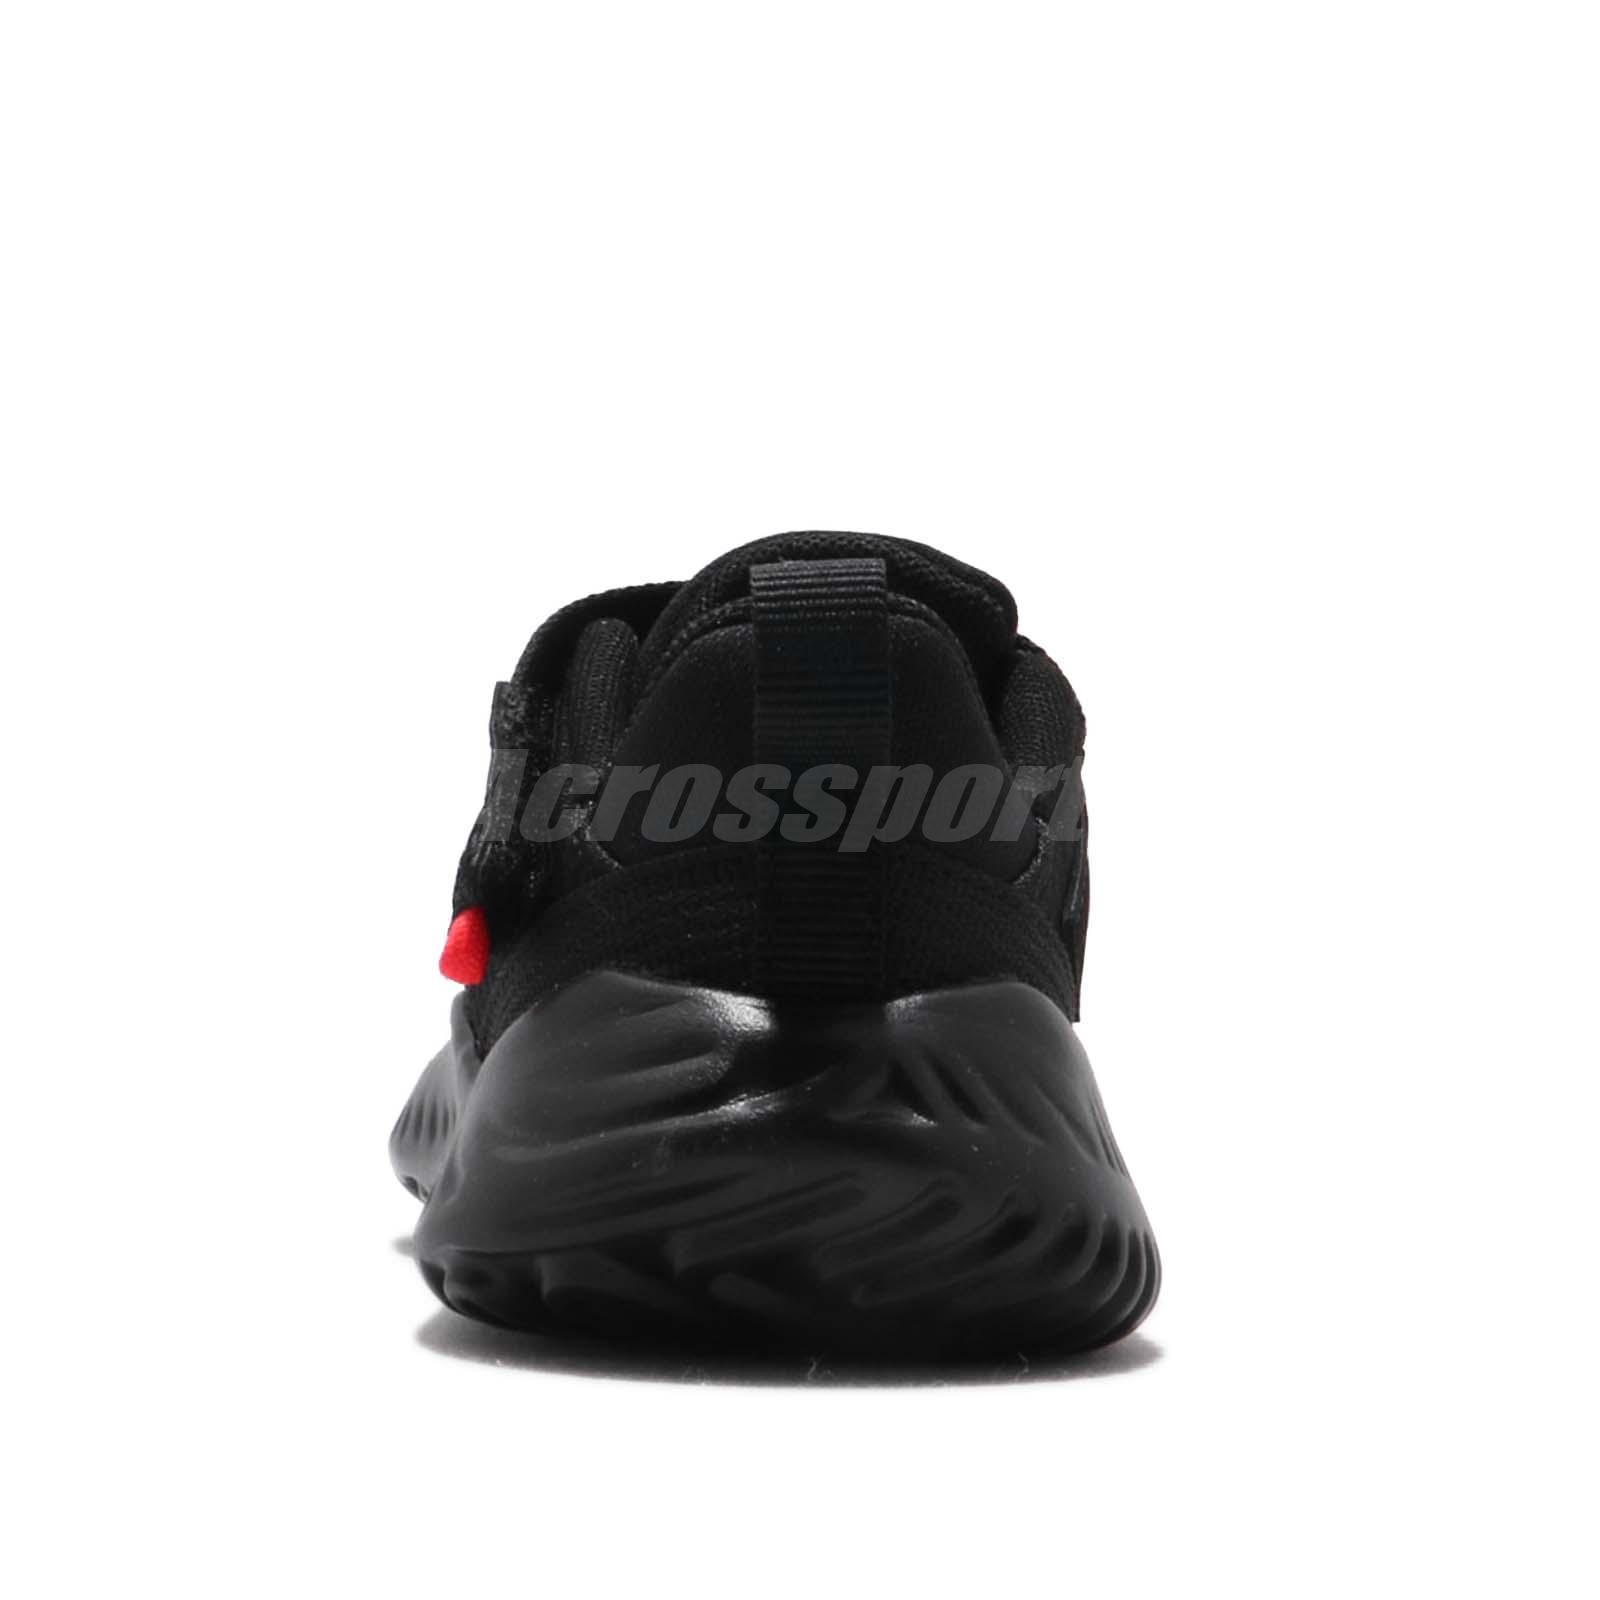 346ef5cd3598 Nike Jordan Proto 23 TD Black Red White Toddler Infant Baby Shoes ...